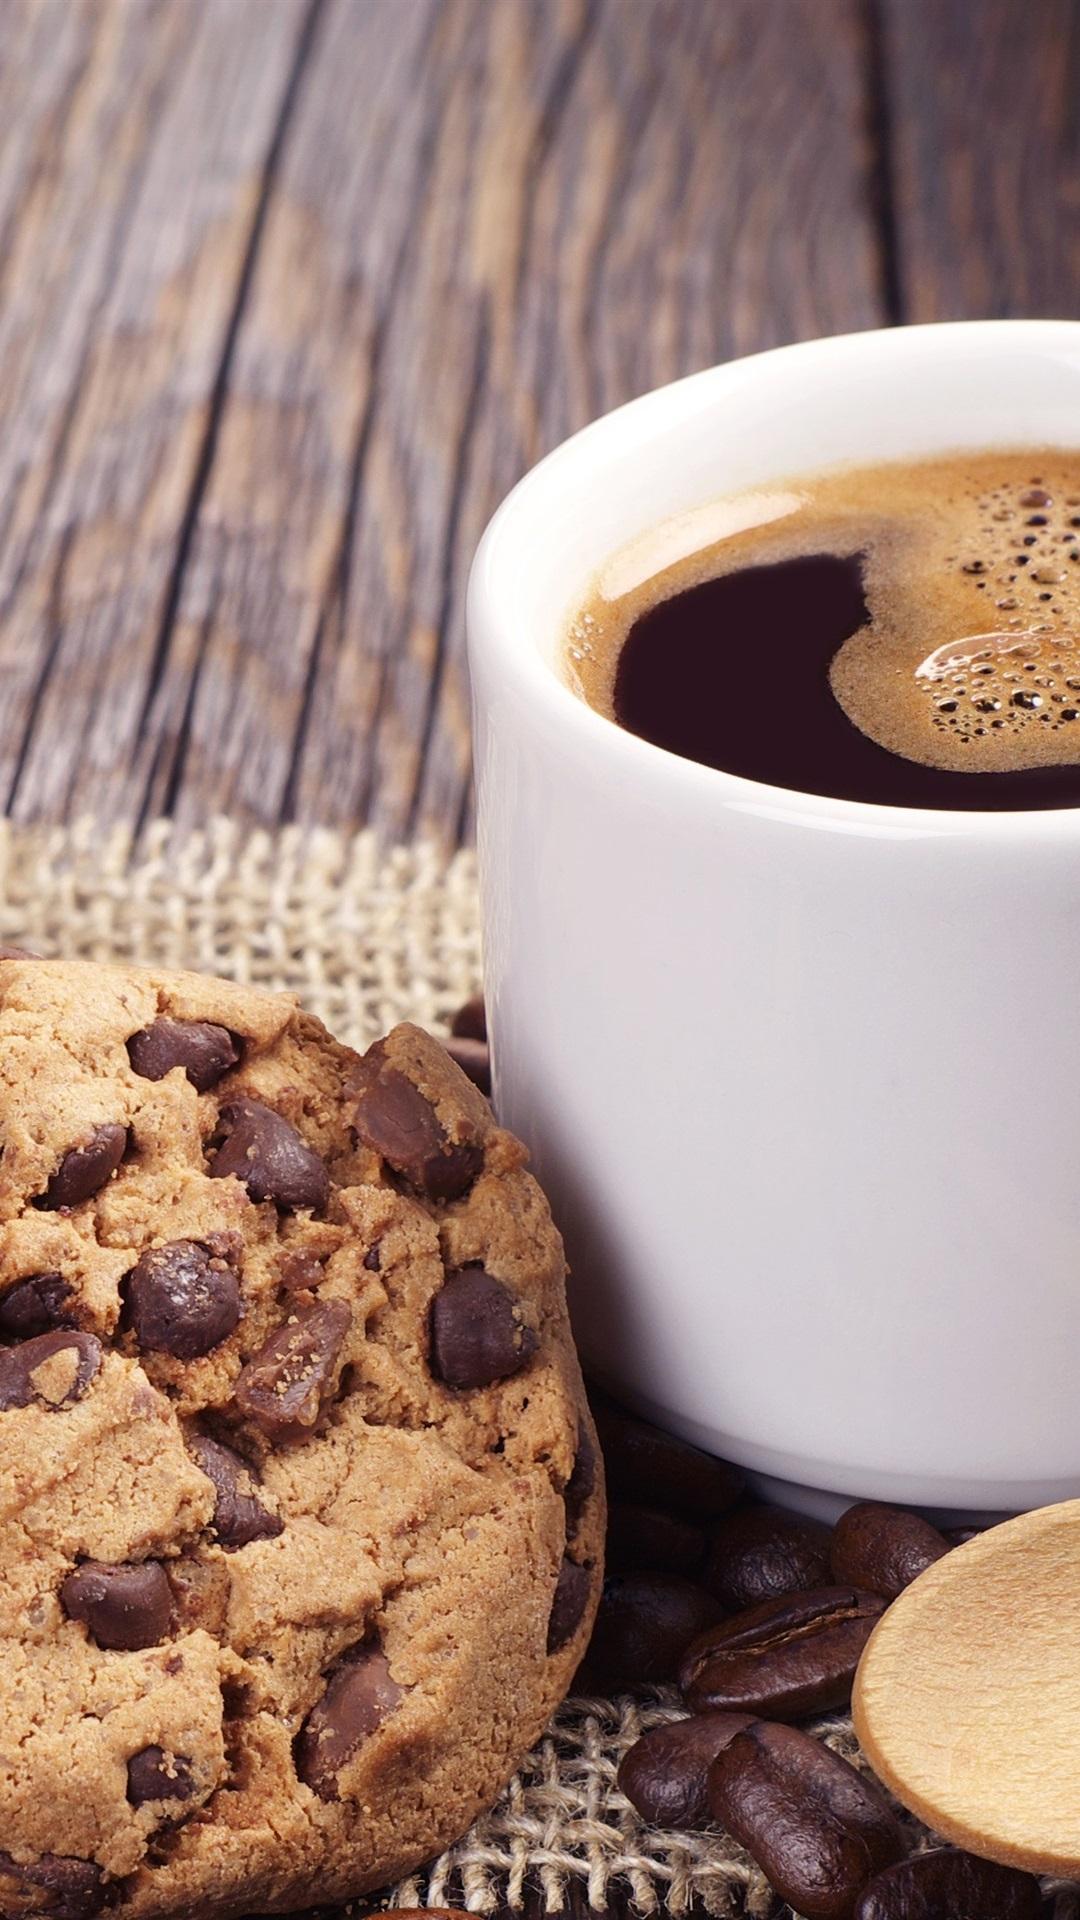 Картинки сладости кофе утро картинках